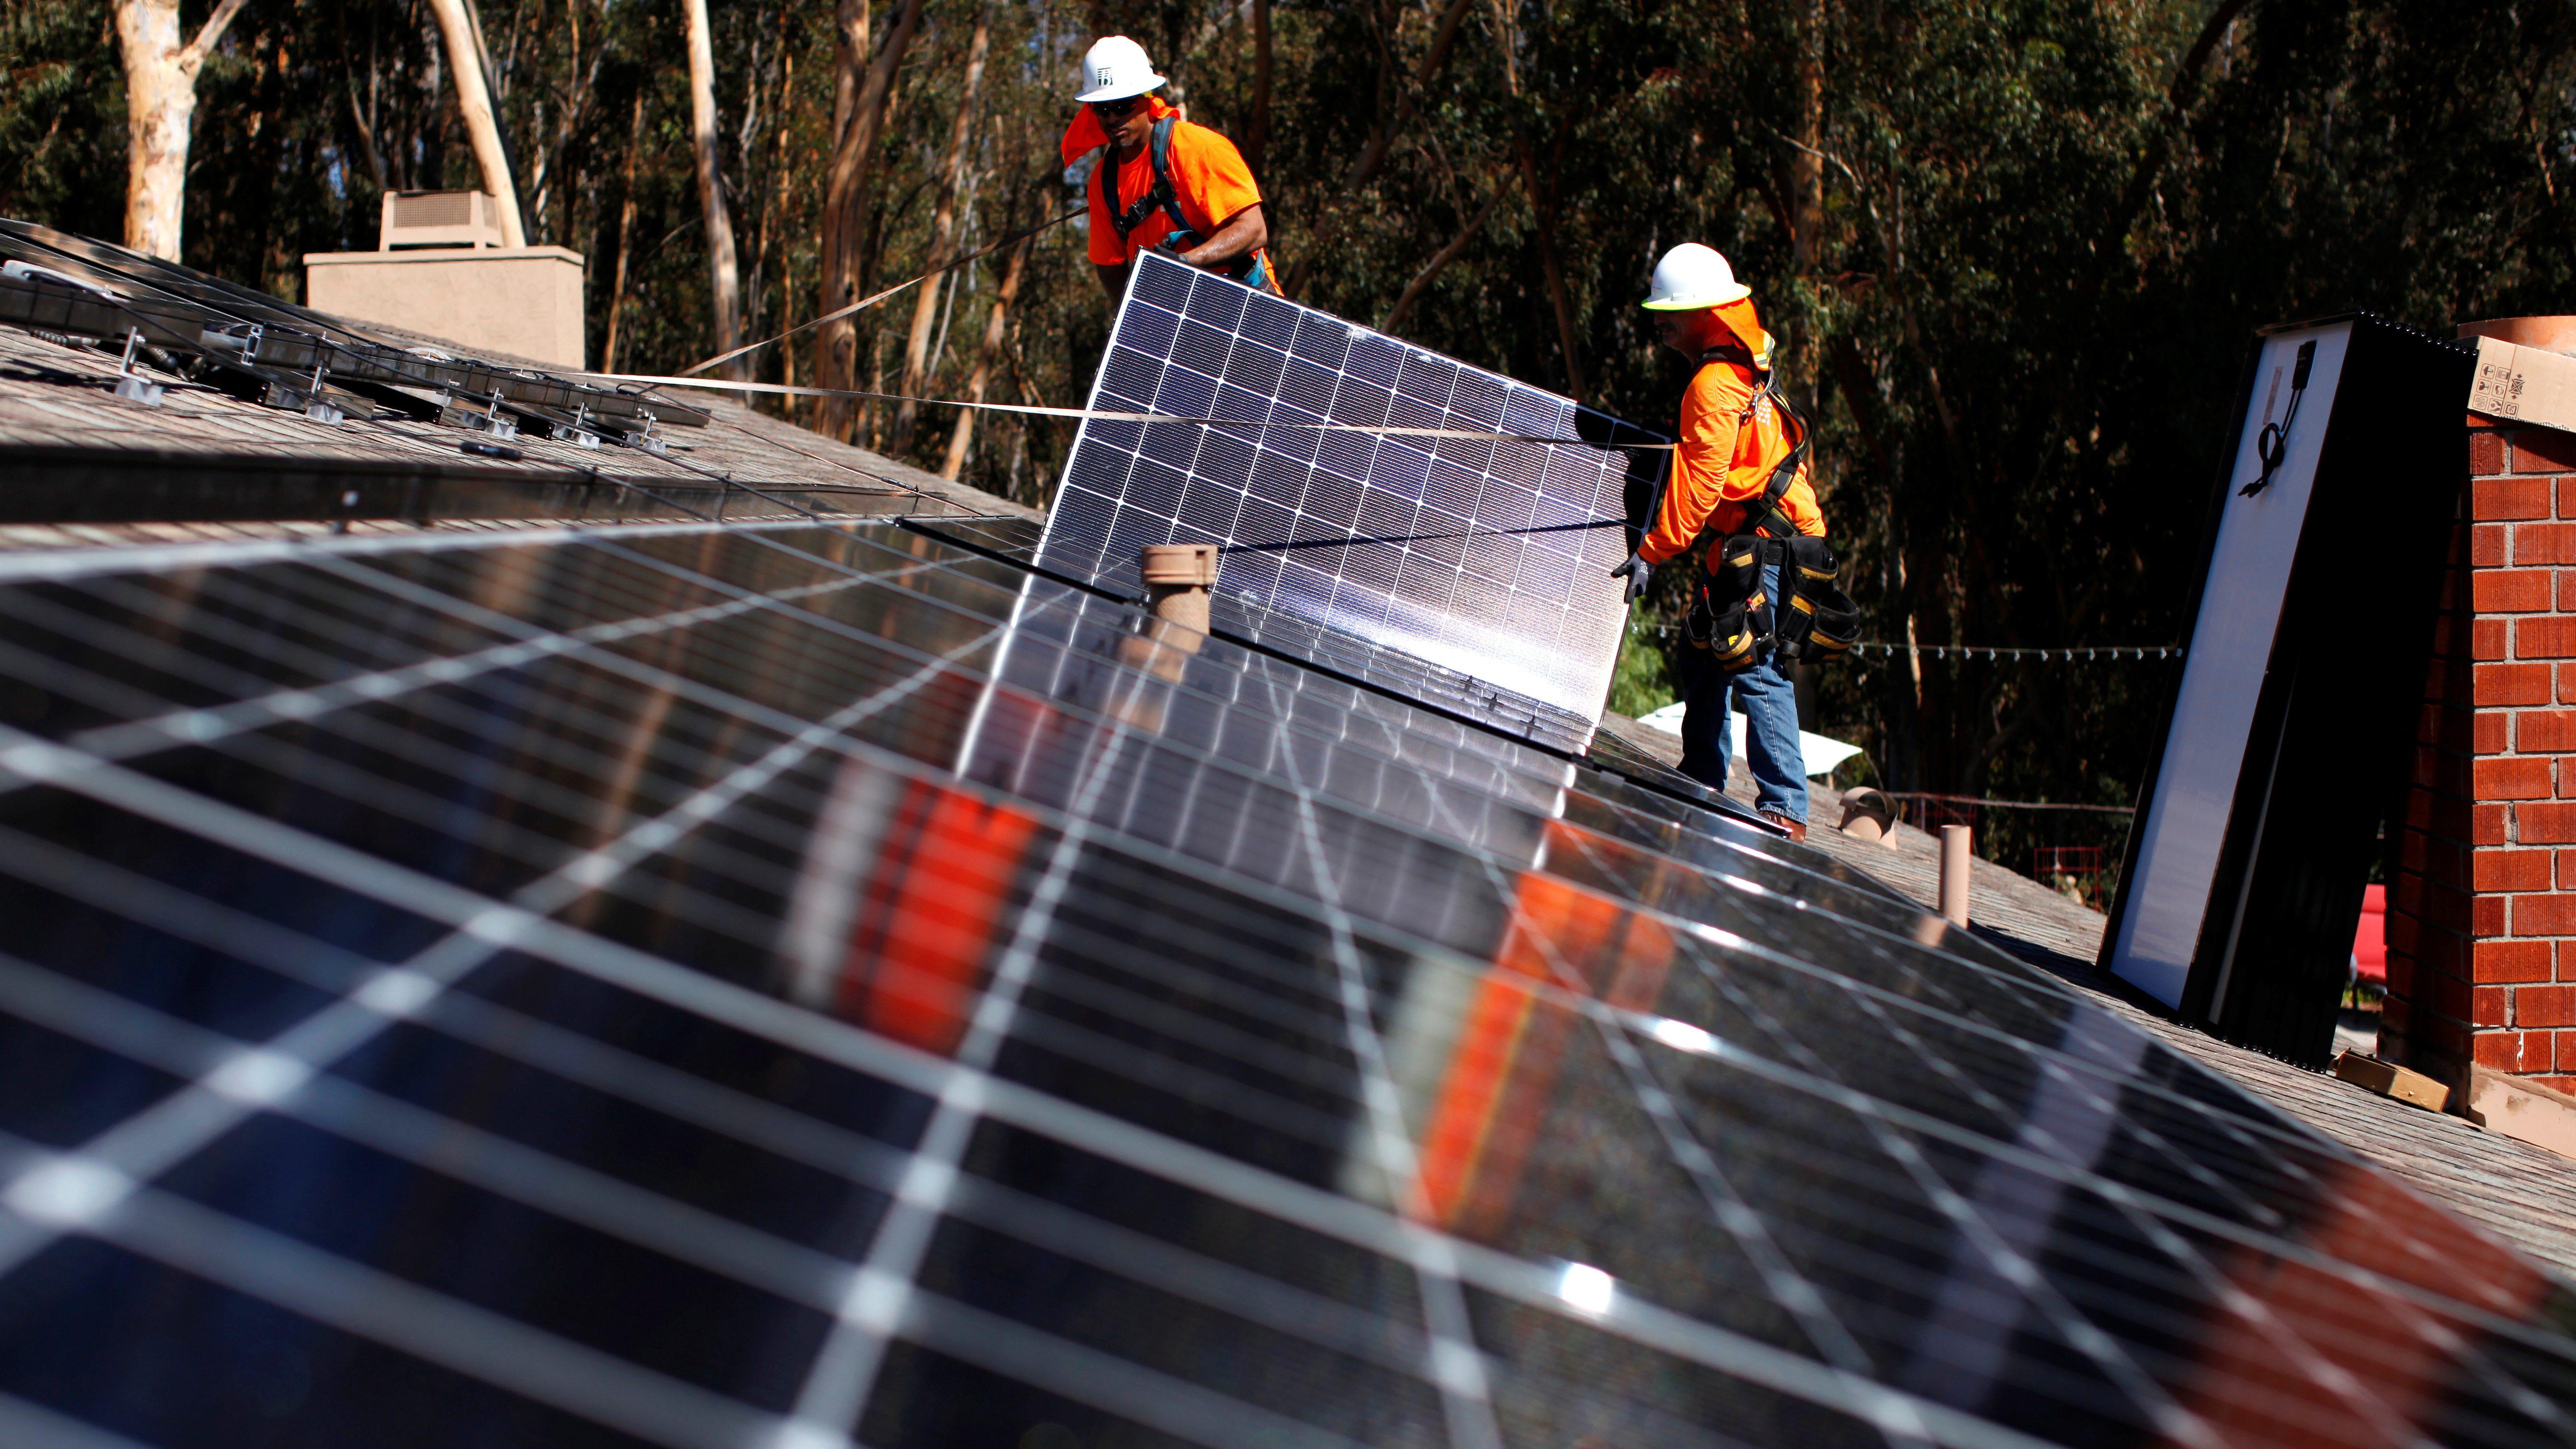 Solar panel installation in California.